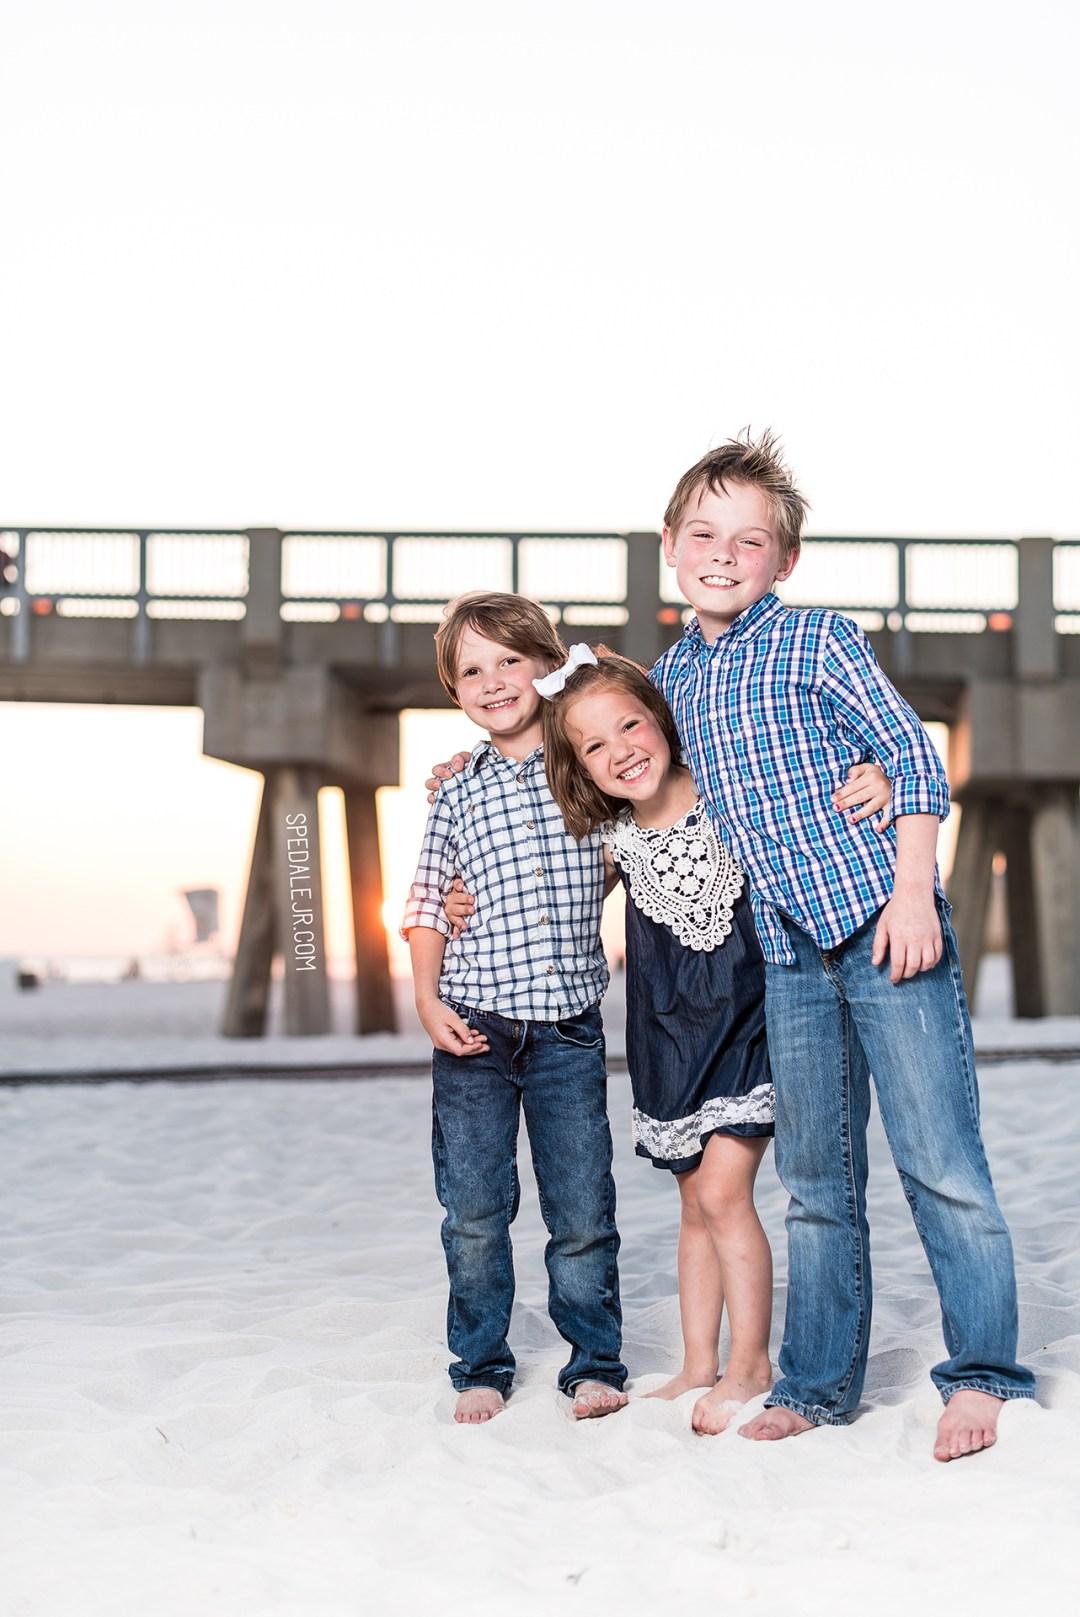 SpedaleJr Beach Family Photography Panama City Beach Florida (2)